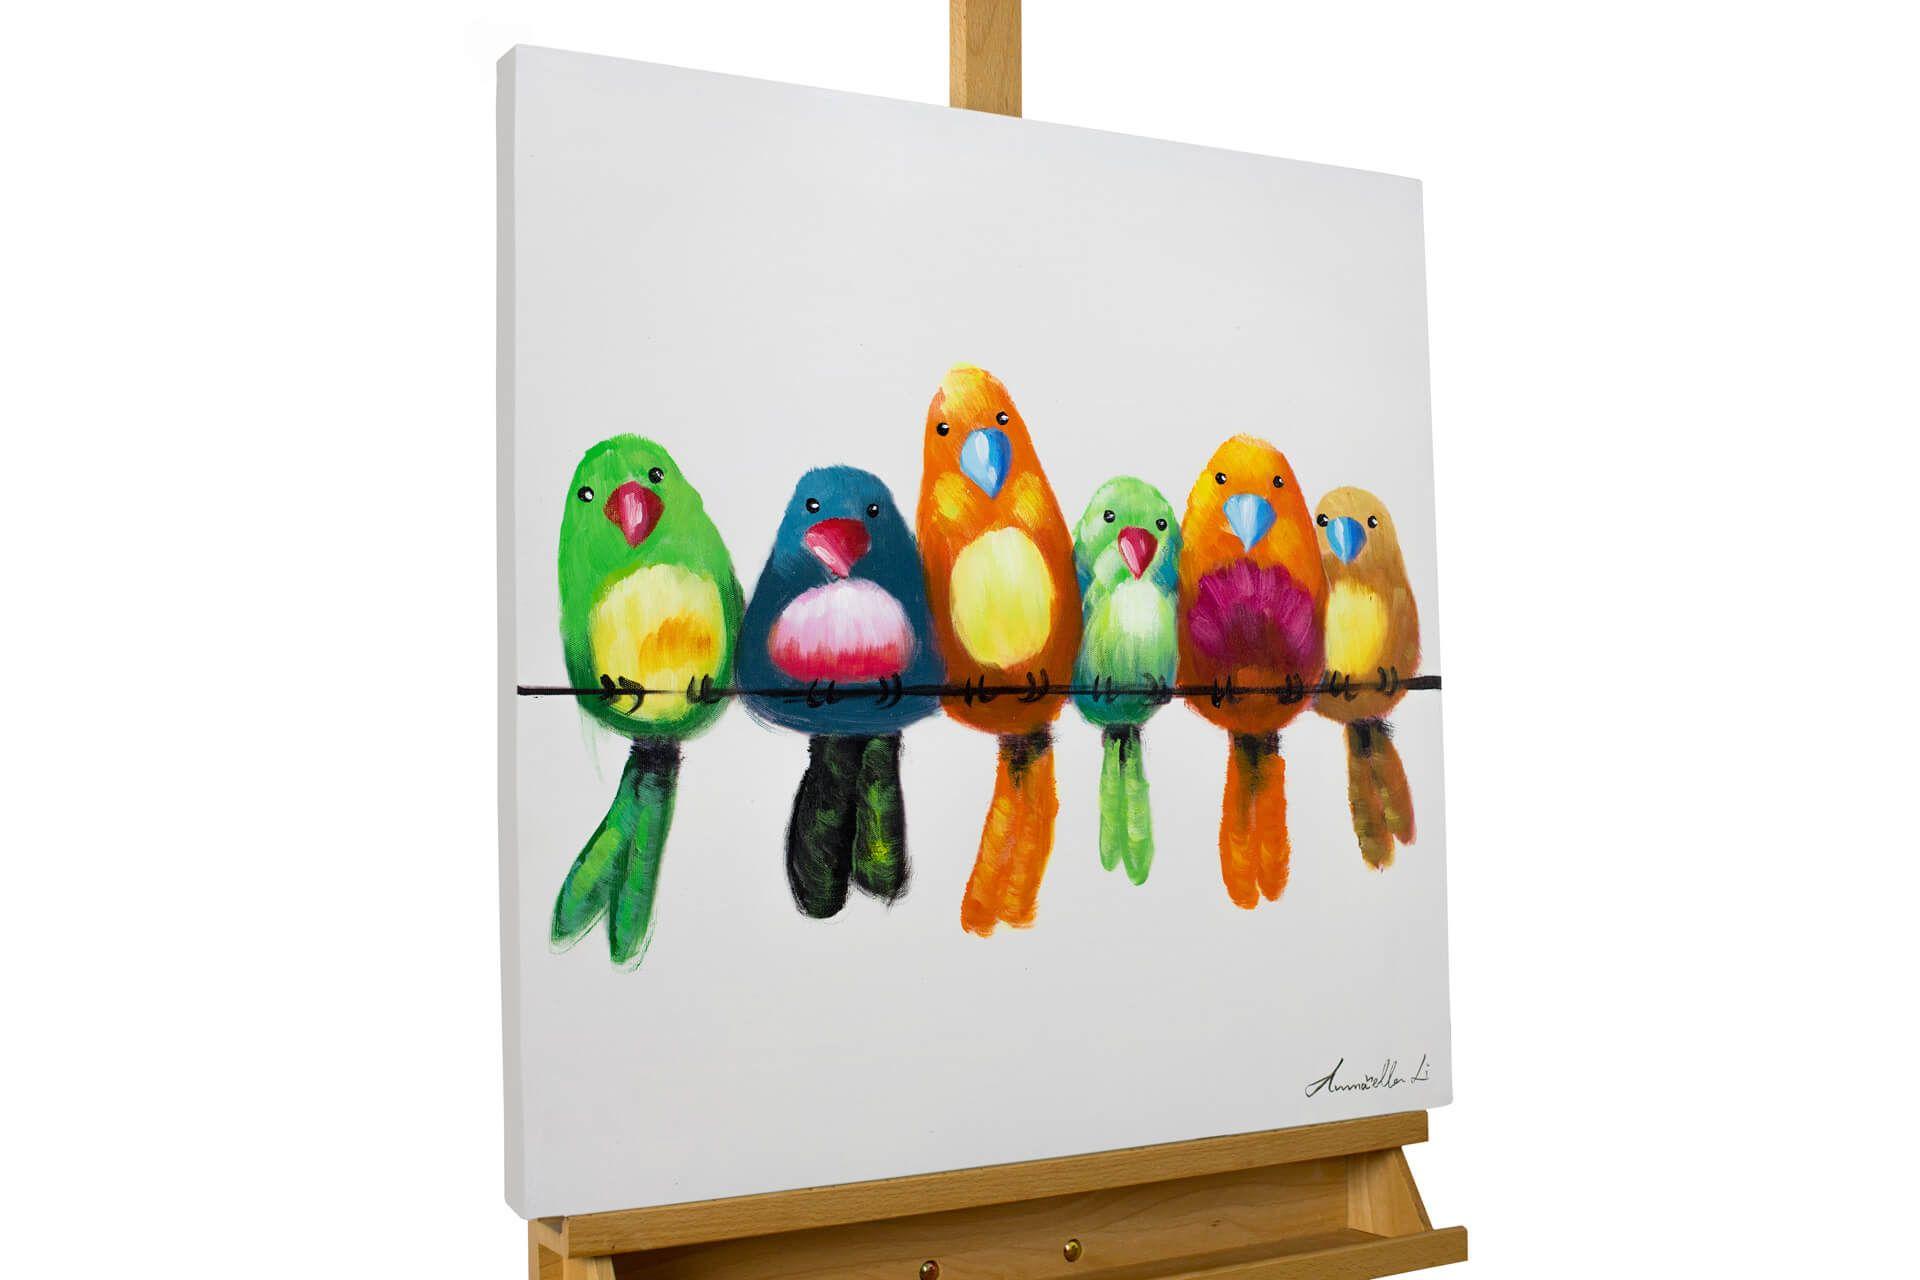 RUOPOTY Rahmen Vögel DIY Malen Nach Zahlen Acryl Auf Leinwand Handgemaltes